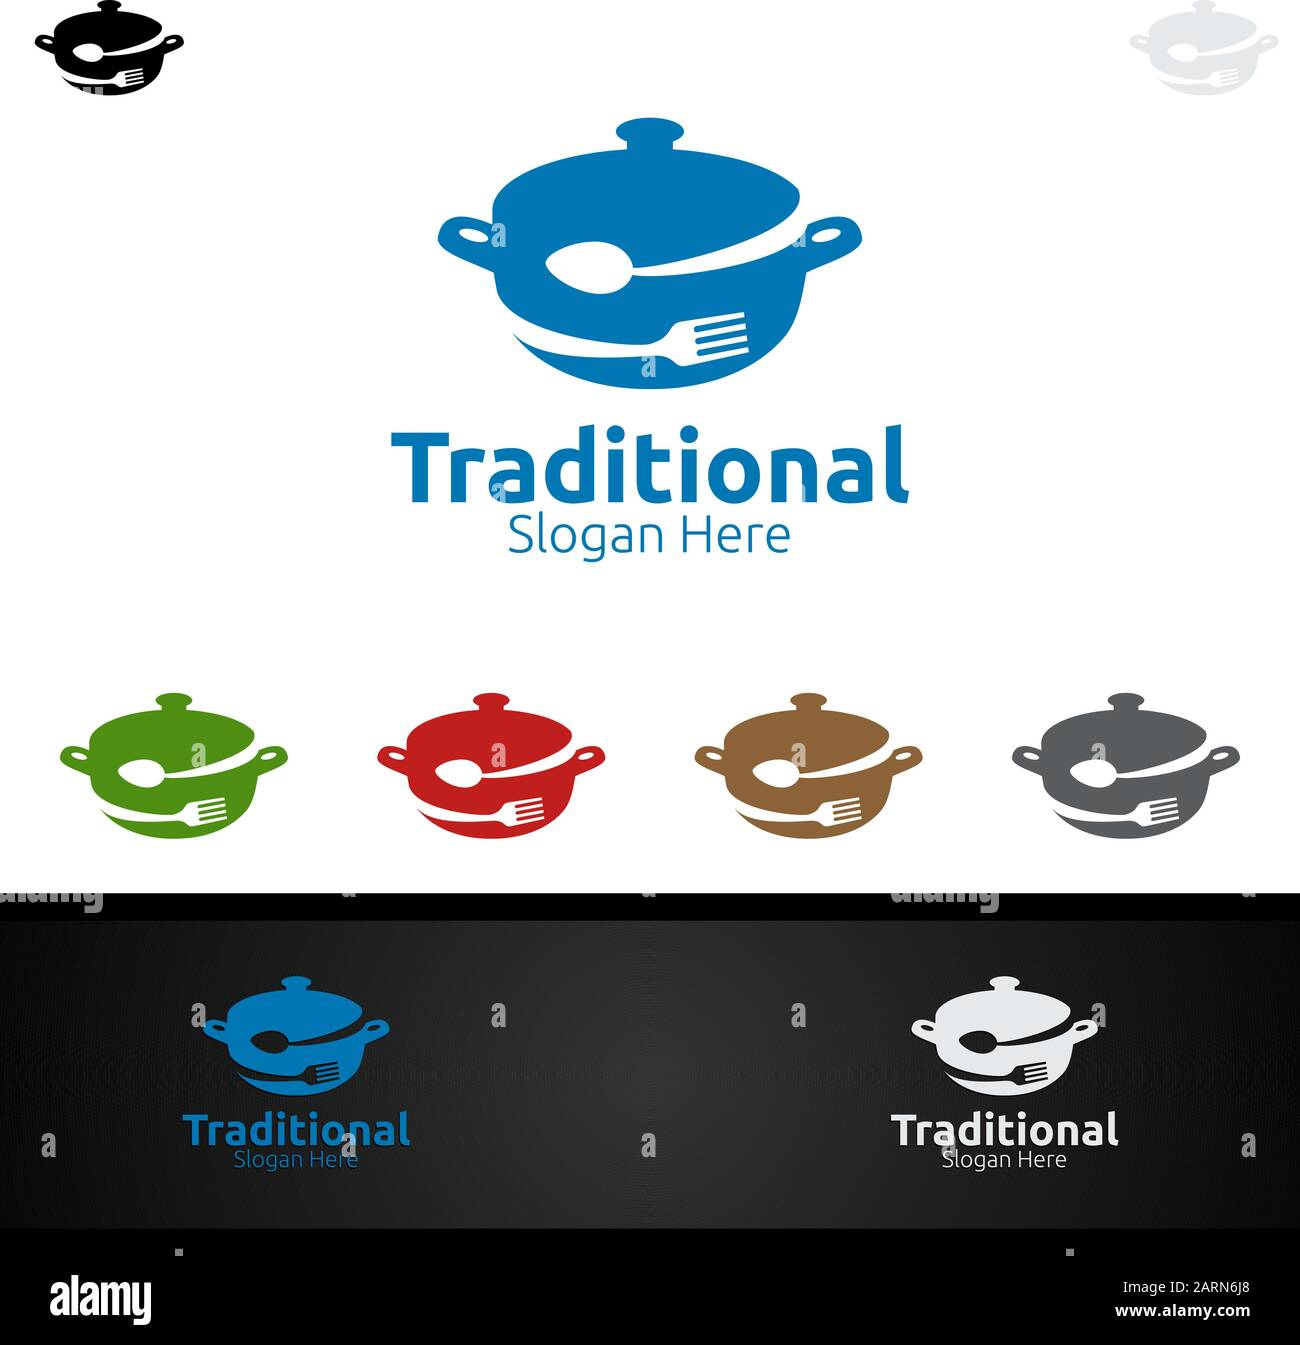 Traditional Food Logo For Menu Restaurant Or Cafe Stock Vector Image Art Alamy